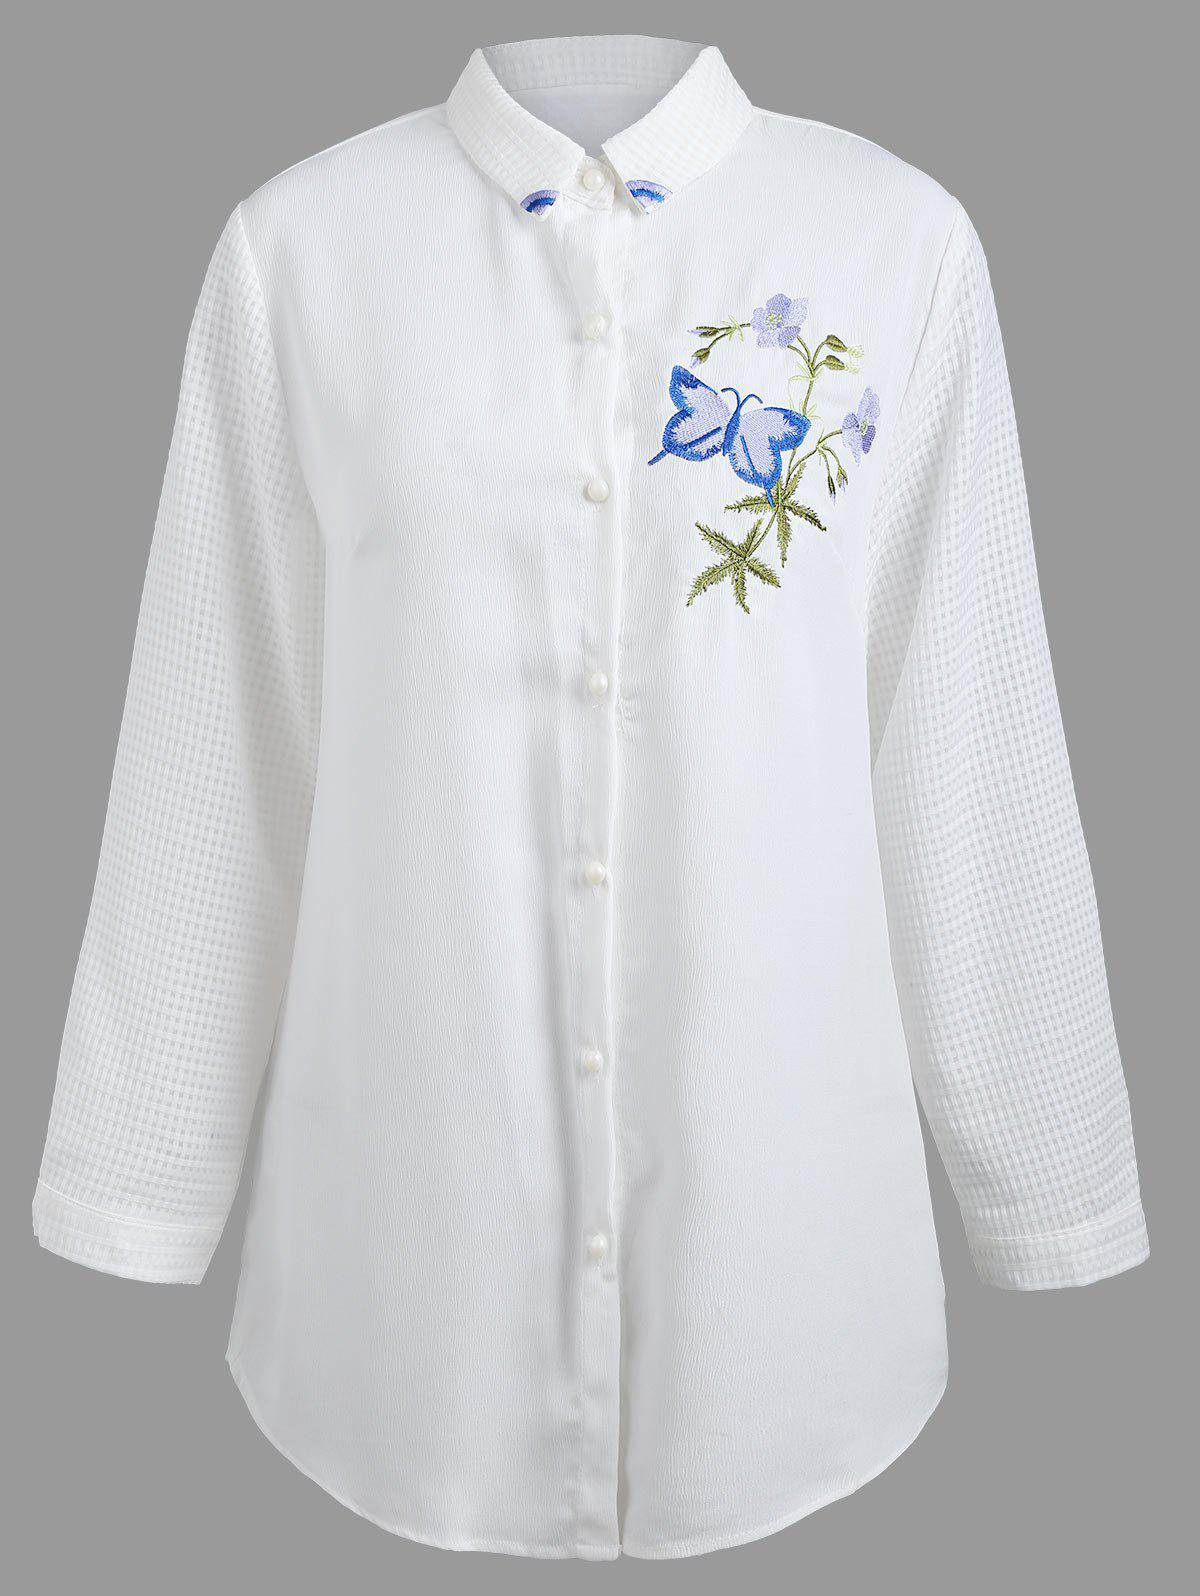 Plus Size Schmetterling Floral gestickte Bluse